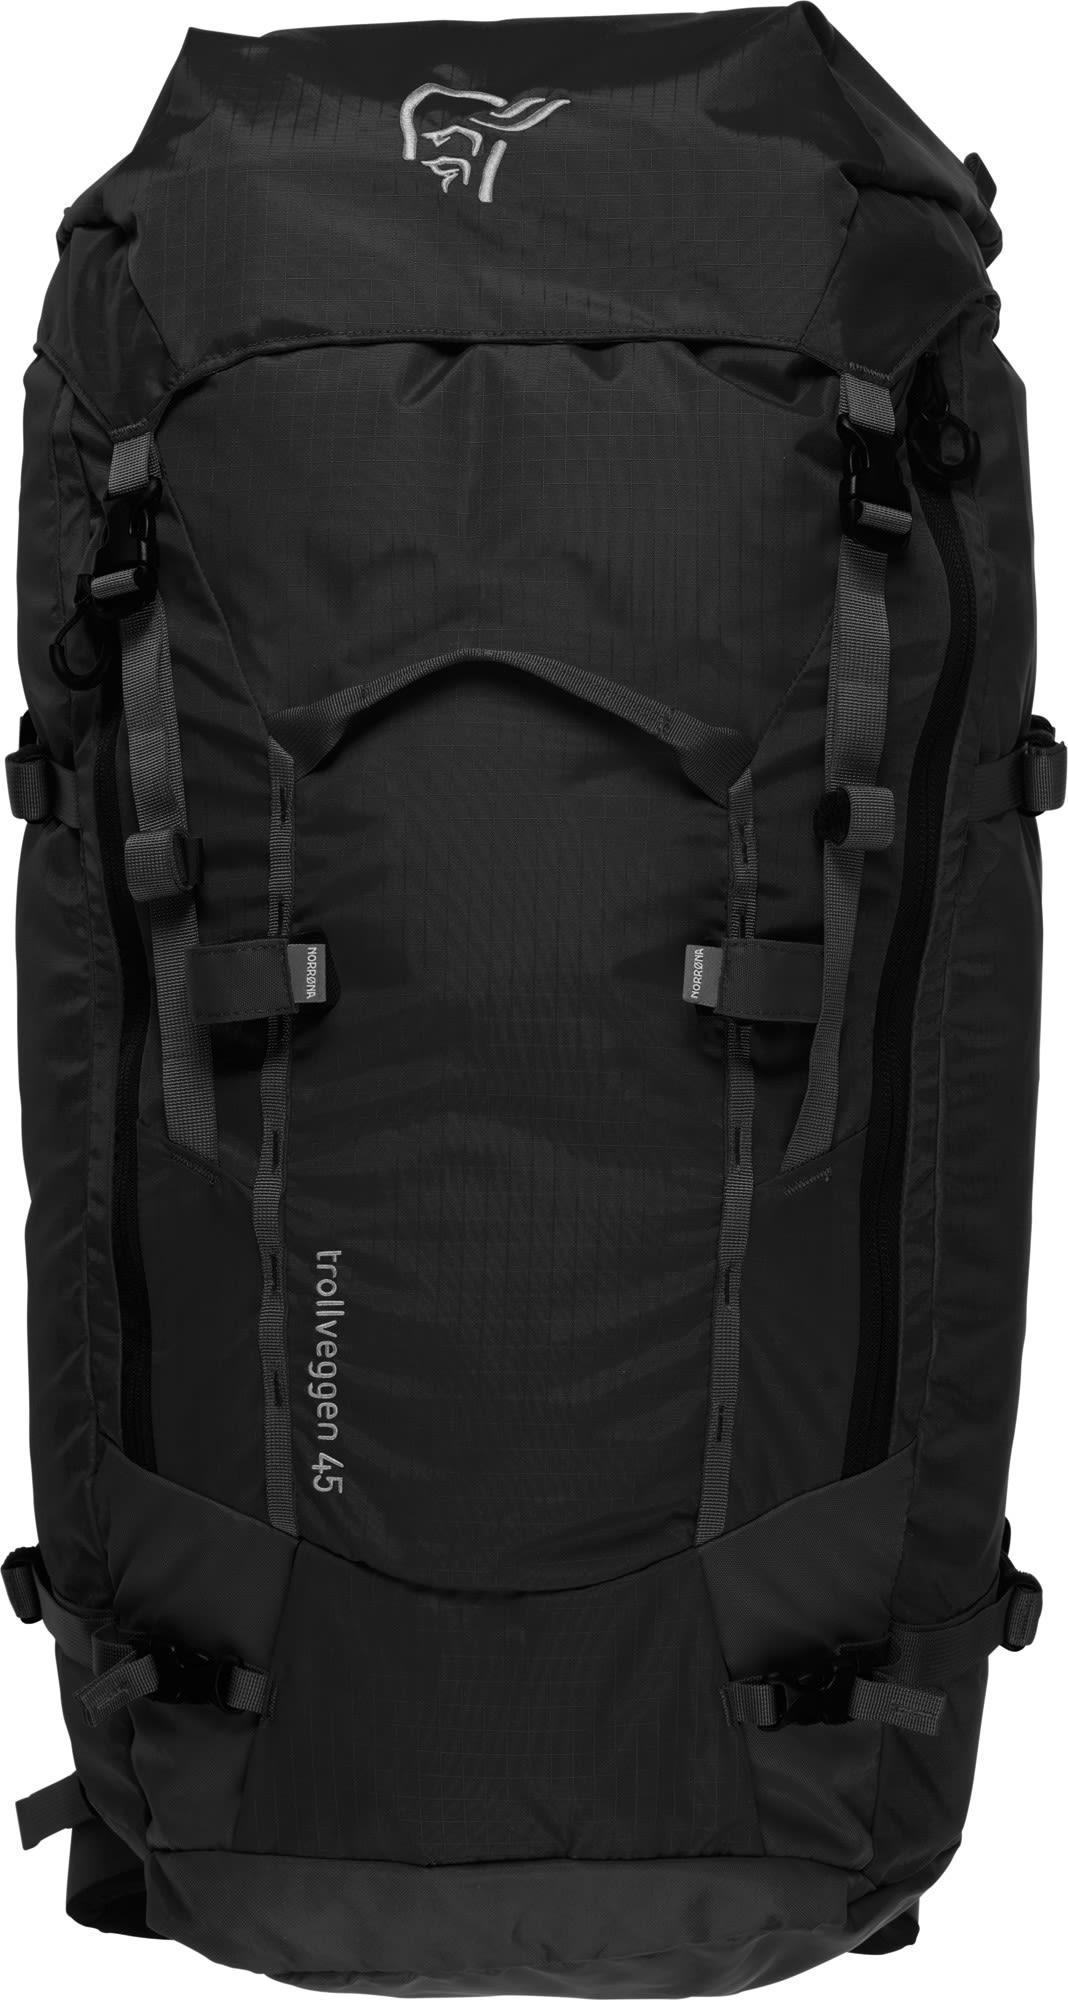 Norrona Trollveggen 45L Pack Schwarz, Male Alpin-& Trekkingrucksack, 45l